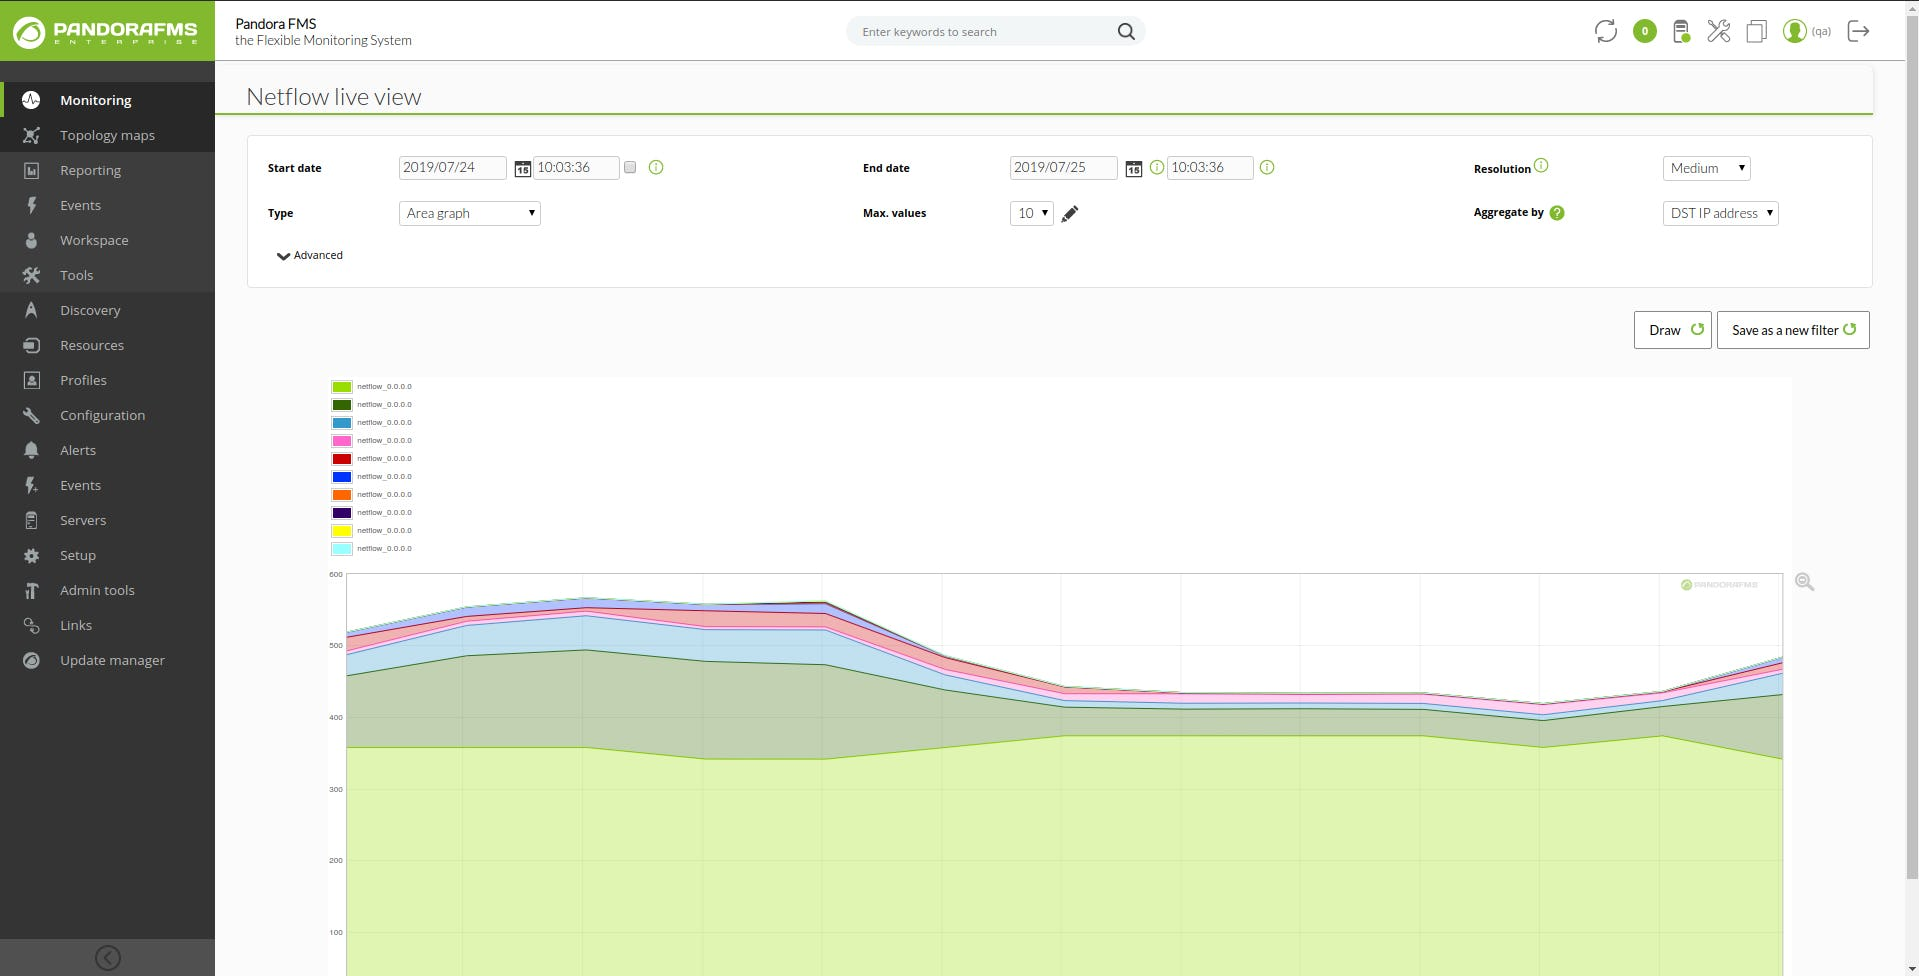 Pandora FMS Software - Pandora FMS netflow view screenshot